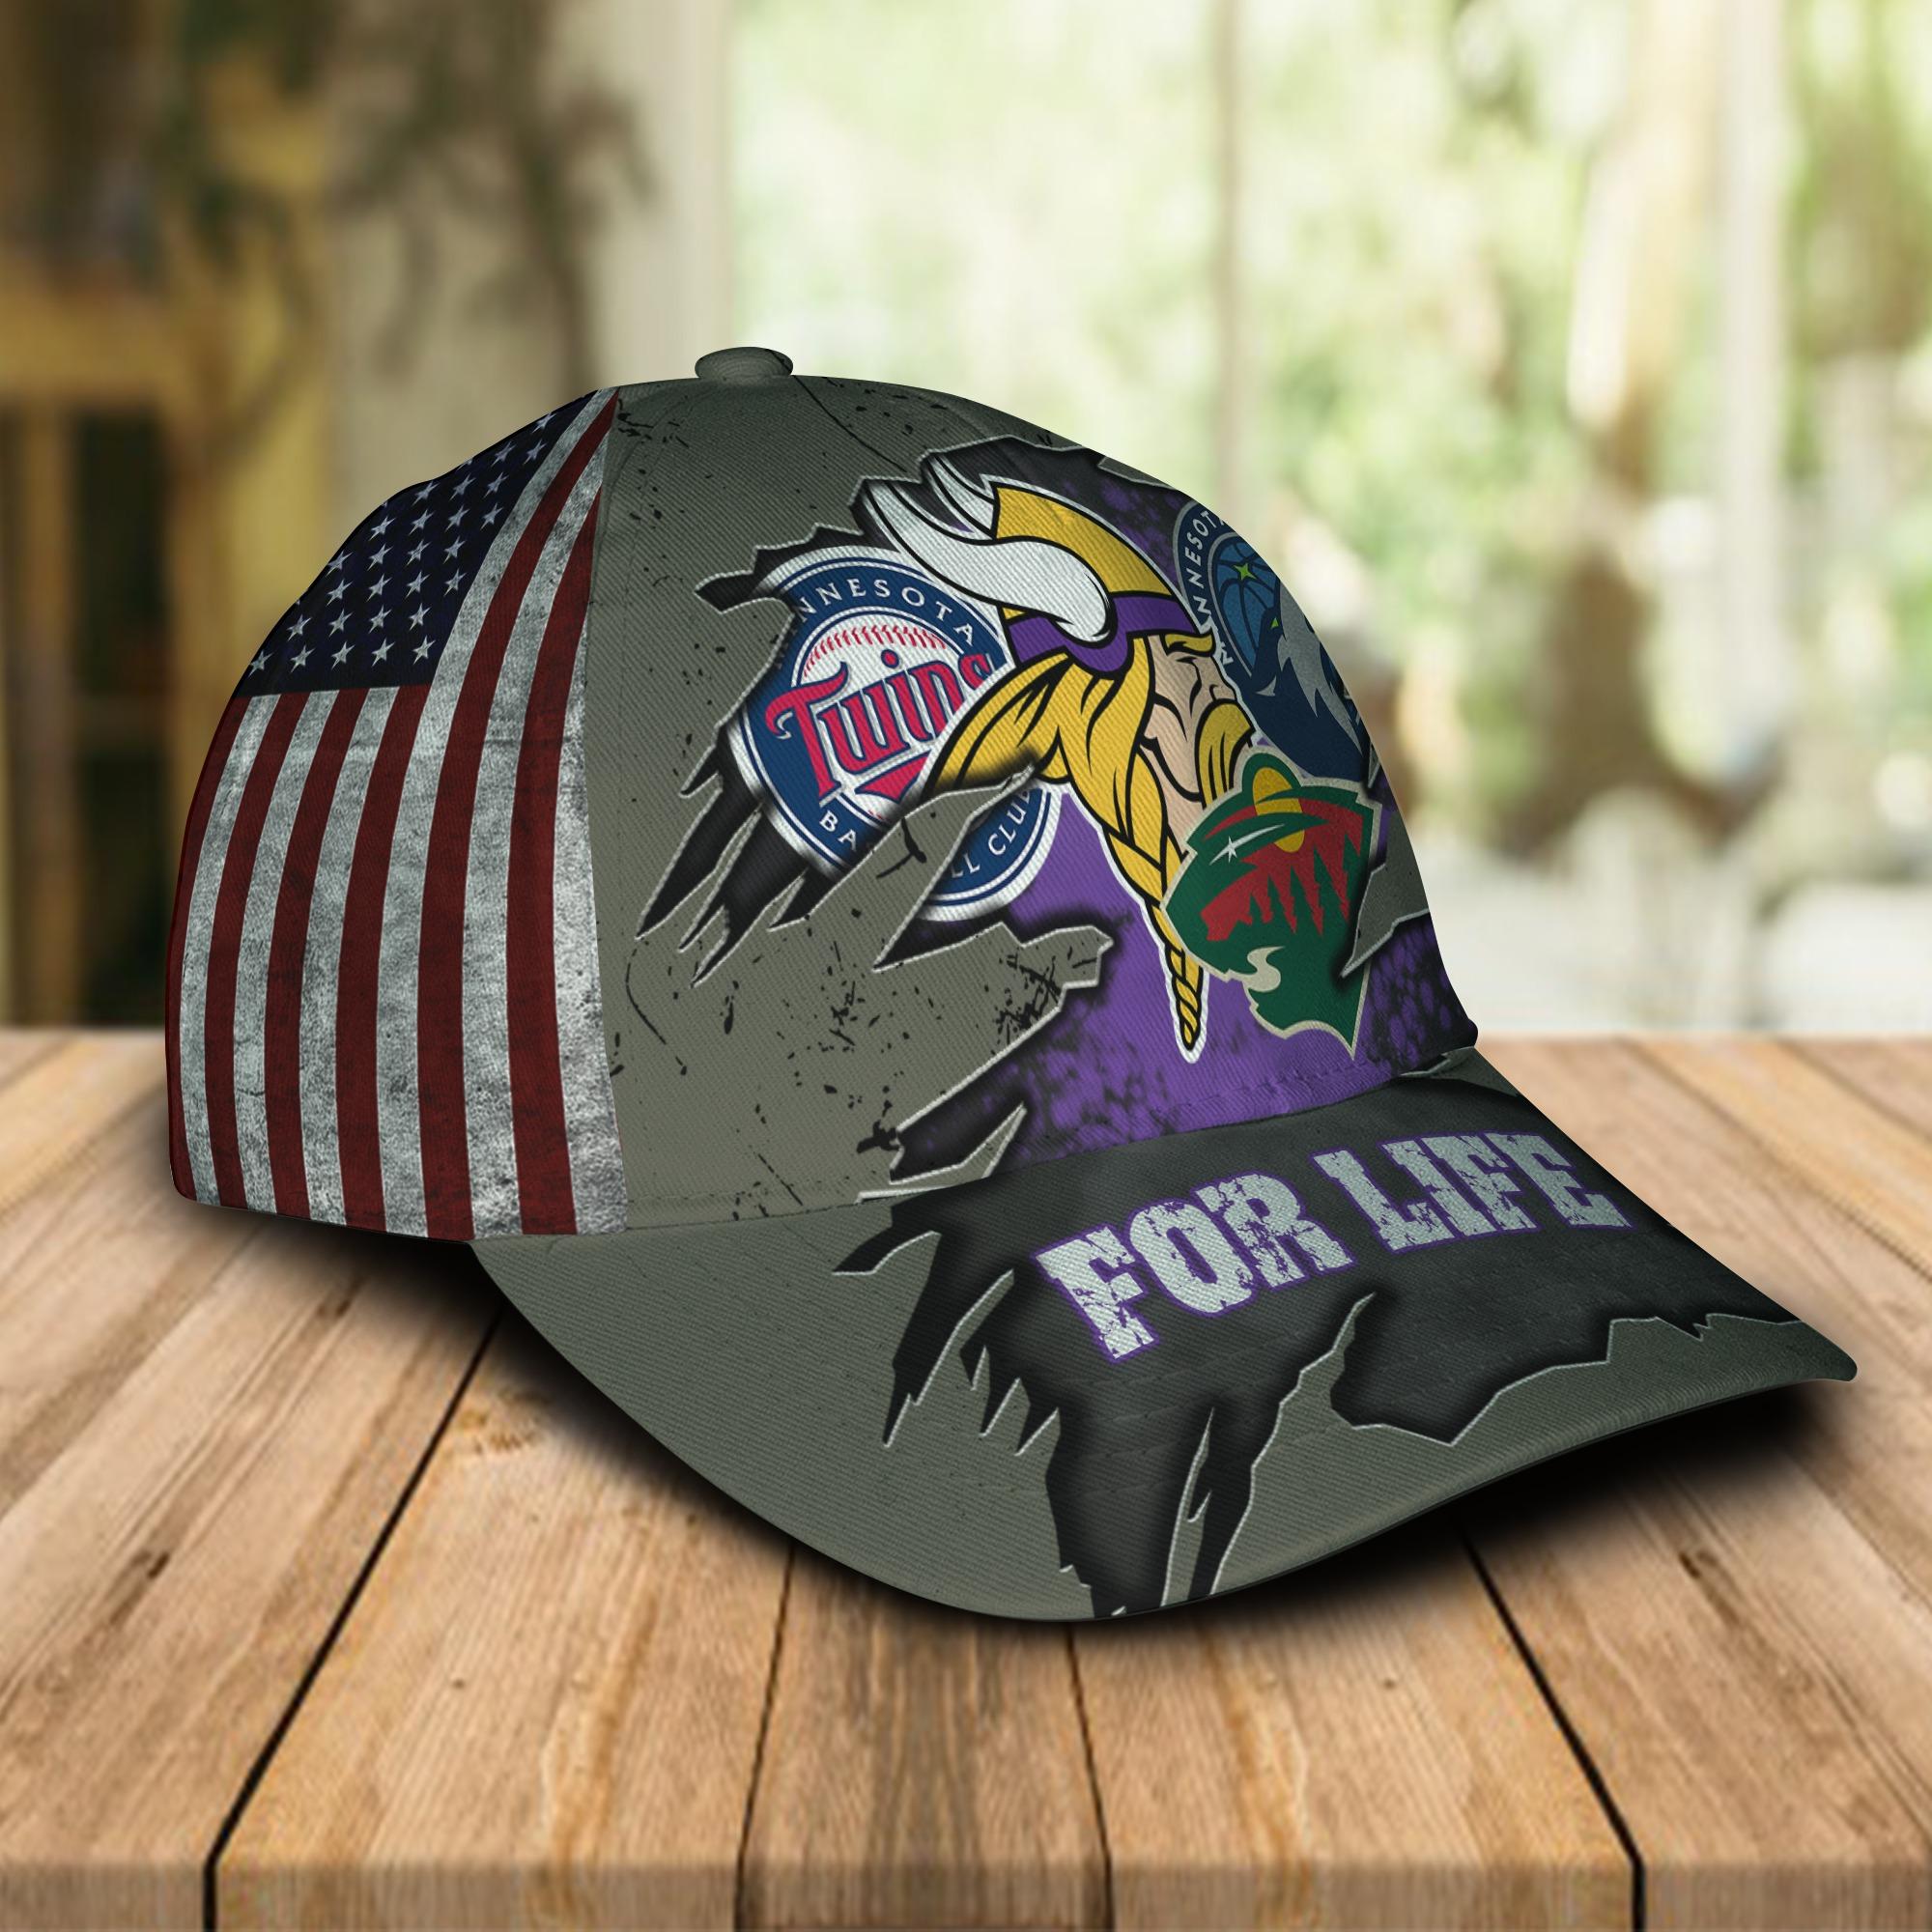 Minnesota Vikings Twins Timberwolves Wild For Life Cap 1